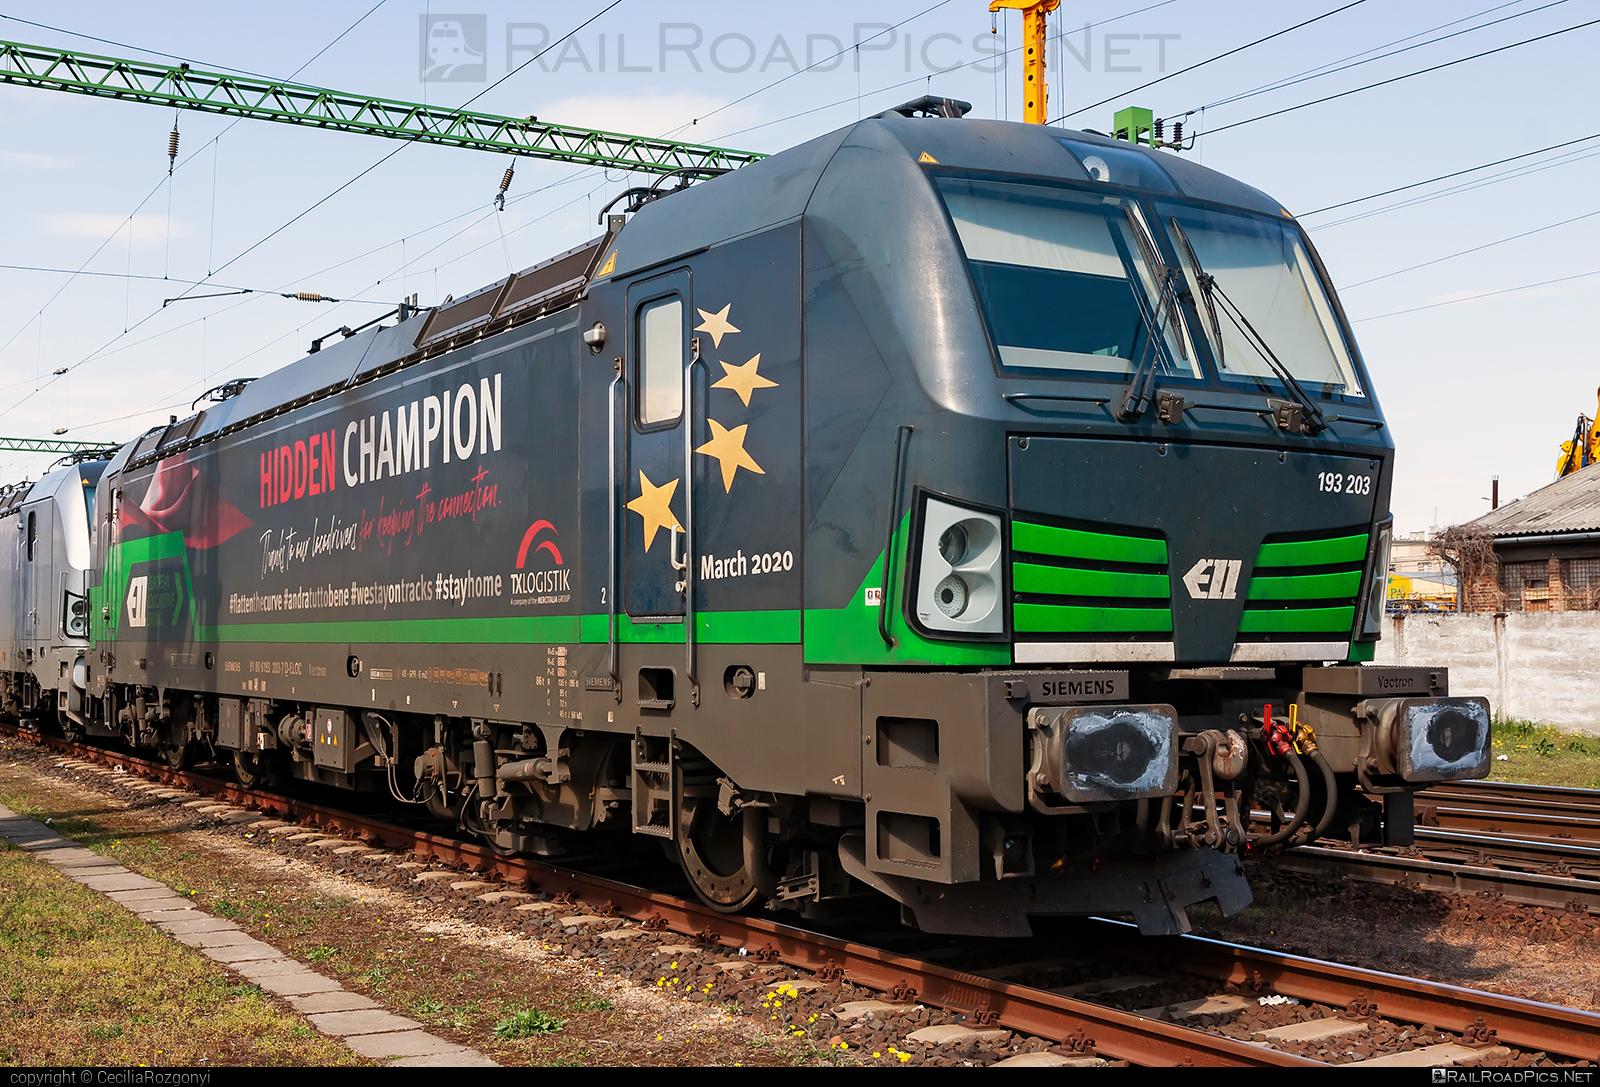 Siemens Vectron AC - 193 203 operated by TXLogistik #ell #ellgermany #eloc #europeanlocomotiveleasing #siemens #siemensvectron #siemensvectronac #txl #txlogistik #vectron #vectronac